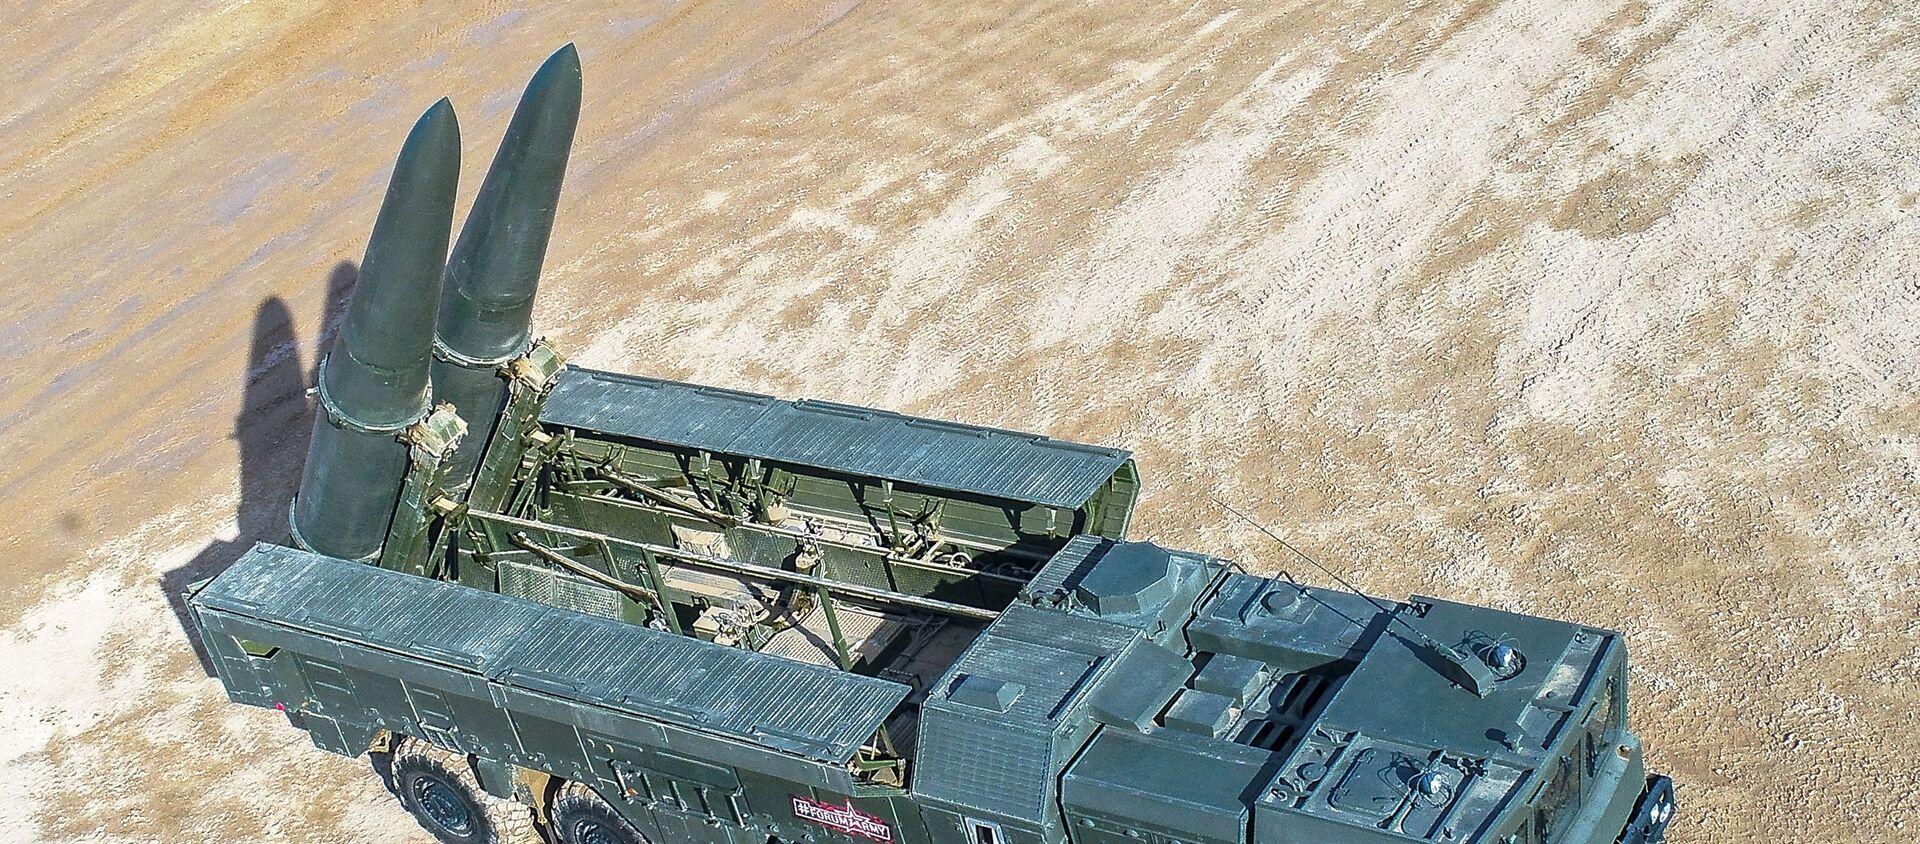 Самоходная пусковая установка 9П78-1 Искандер-М  - Sputnik Азербайджан, 1920, 07.04.2021